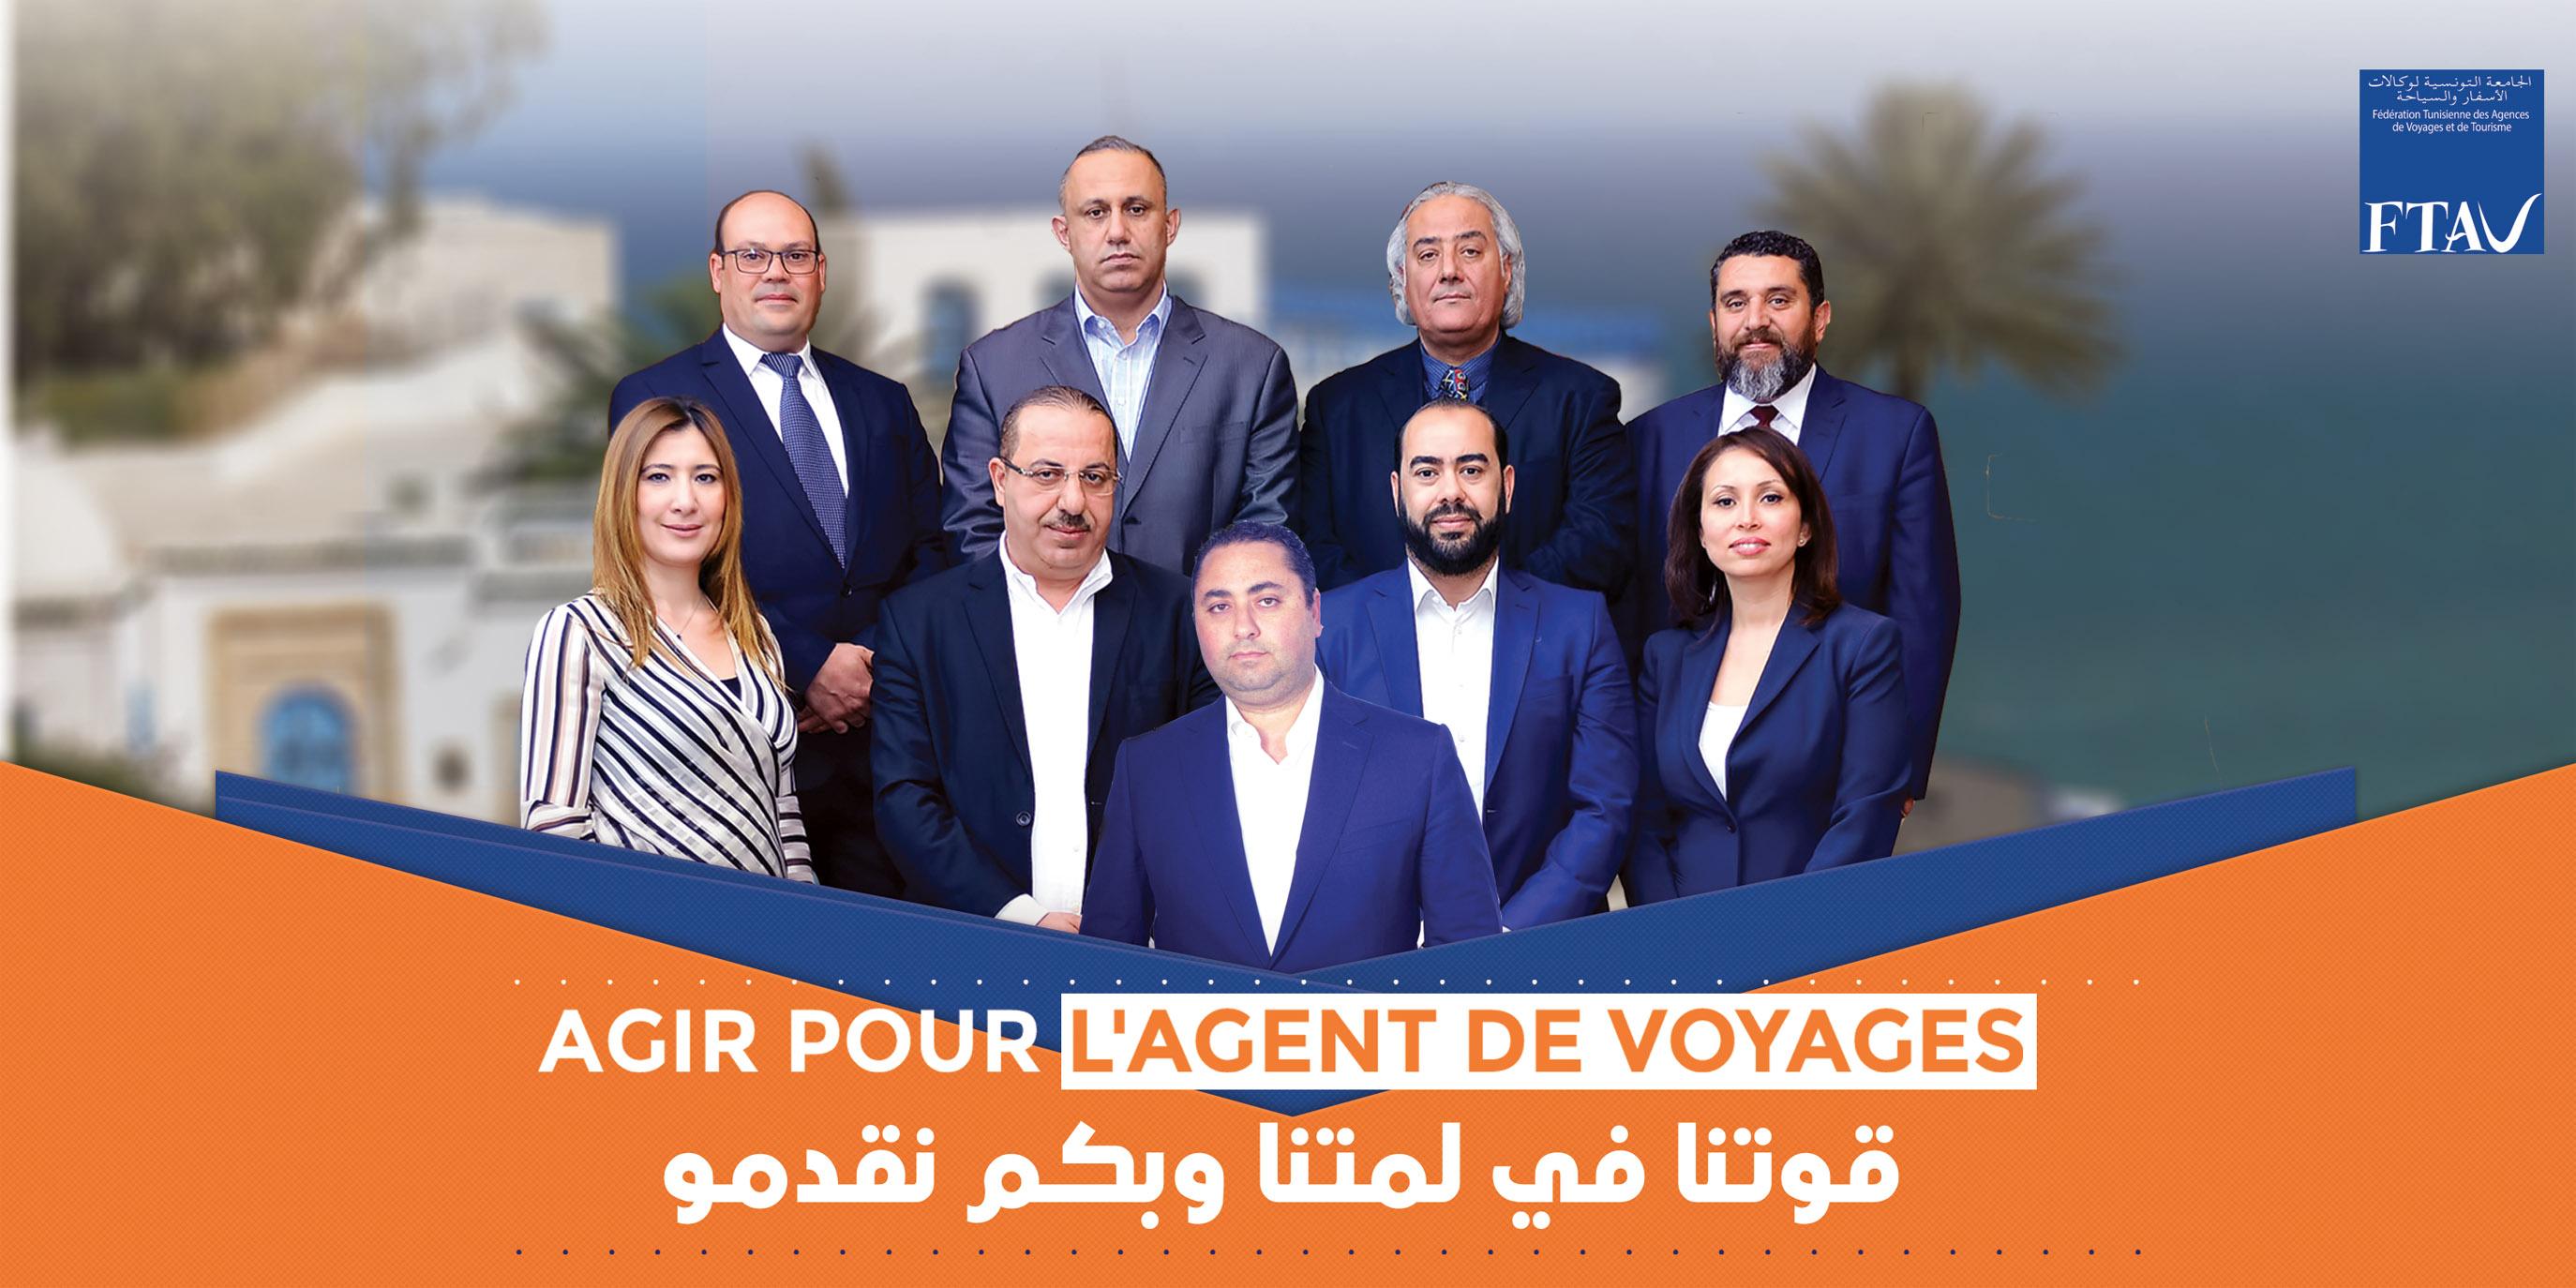 agents-030418-1.jpg